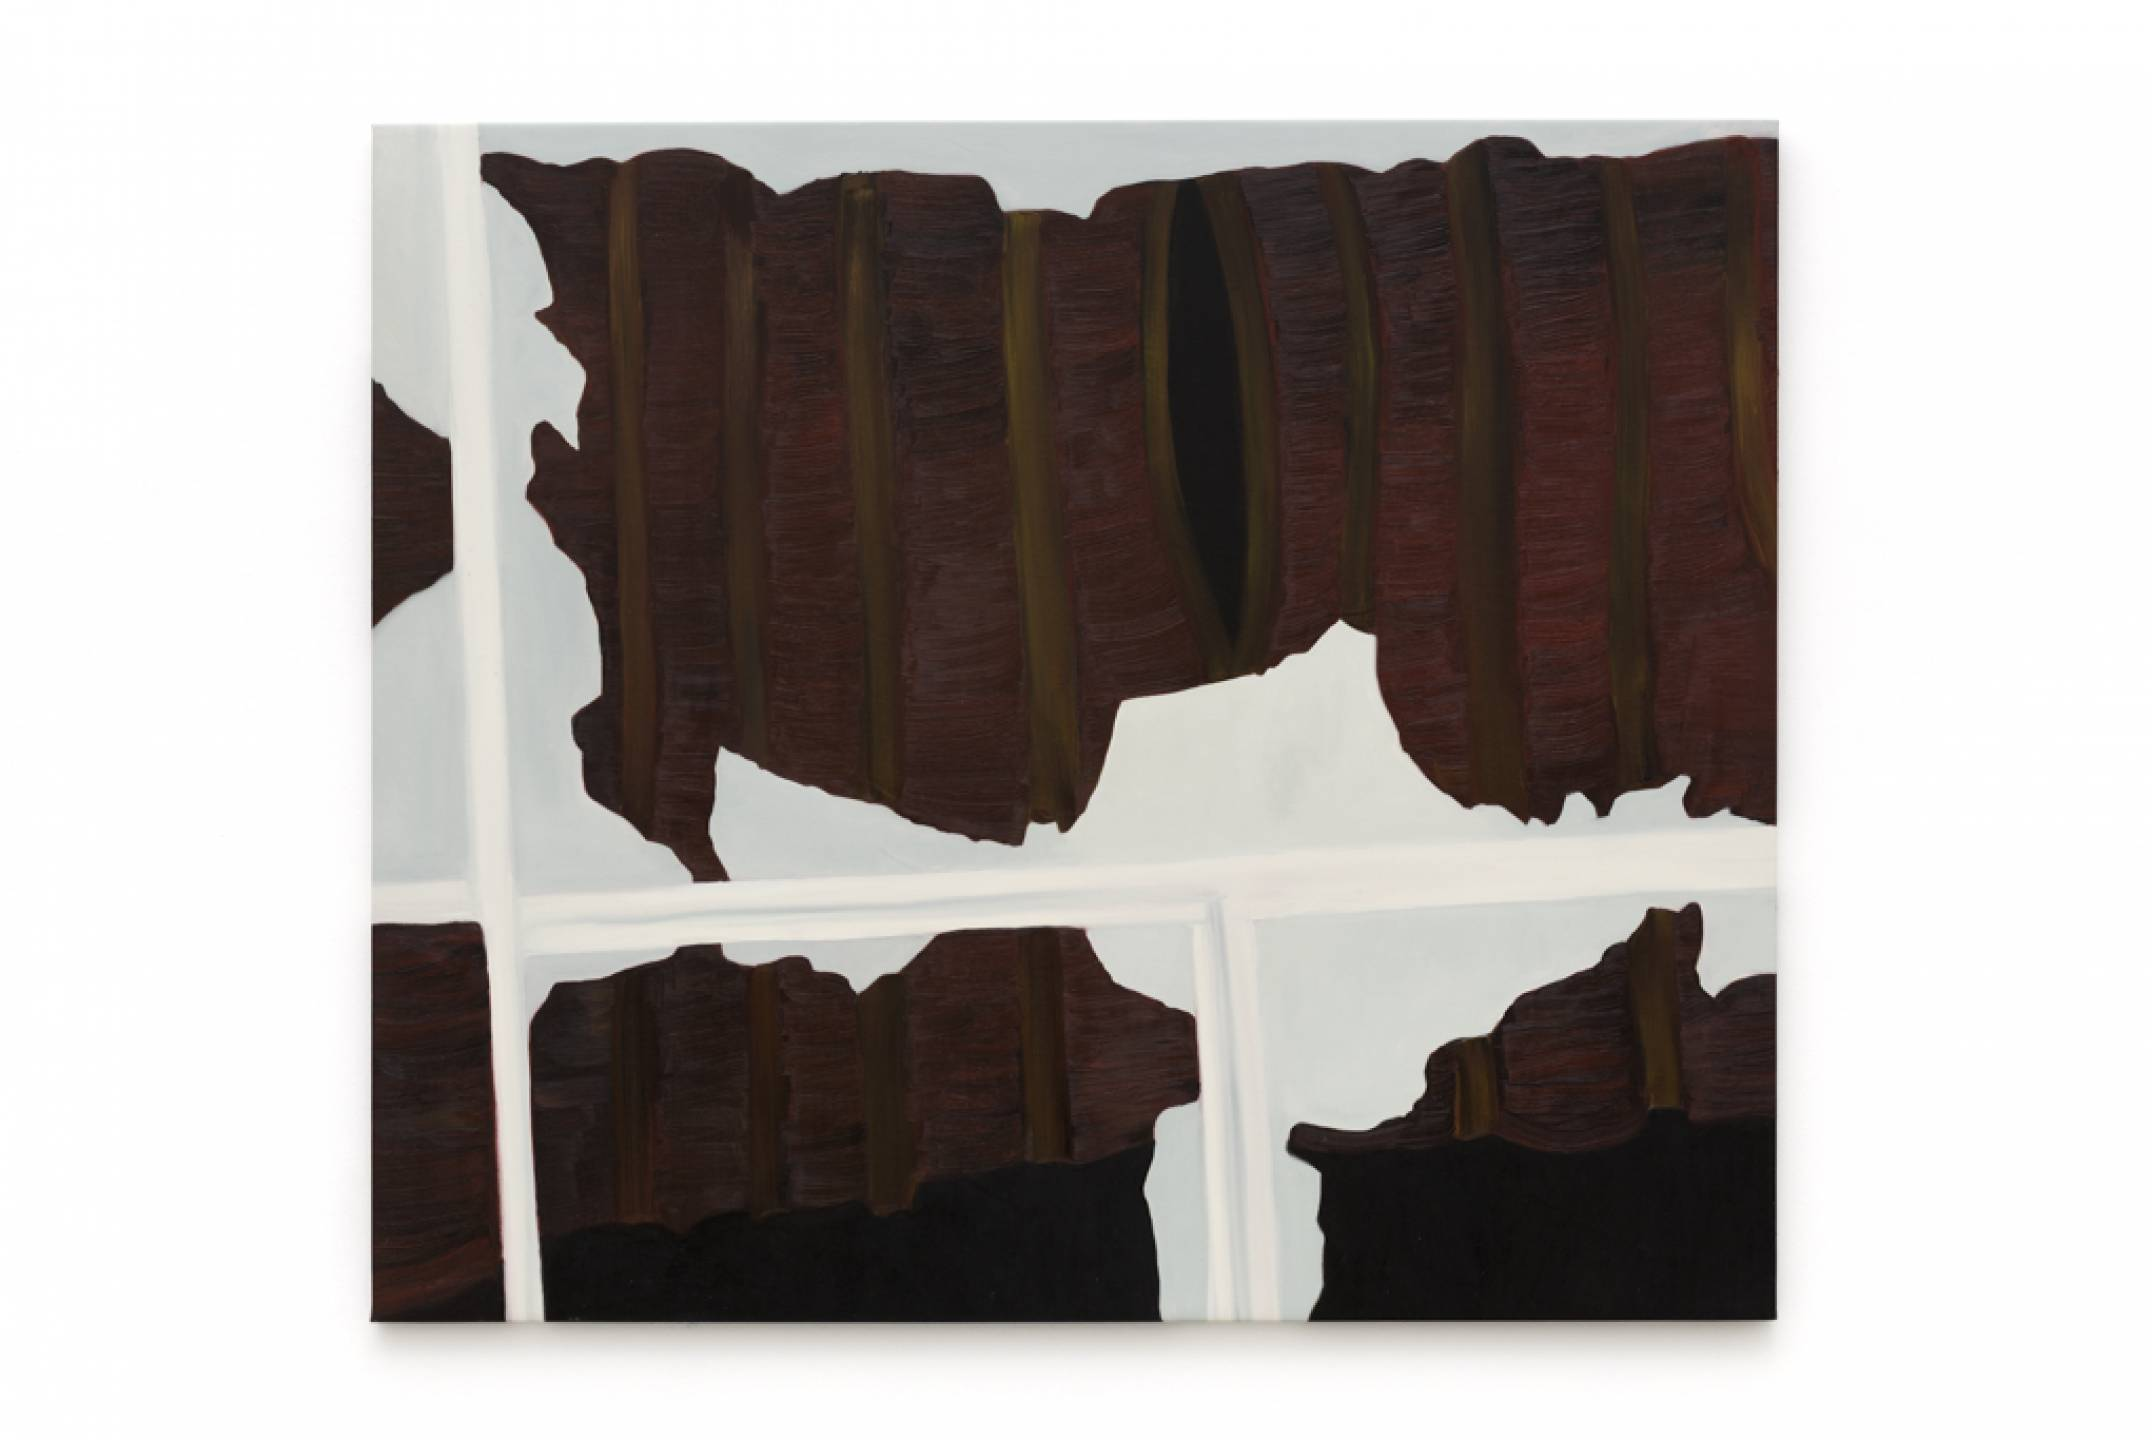 Marina Perez Simão,&nbsp;<em>untitled</em>, 2017,&nbsp;oil on canvas, 130 × 150 cm - Mendes Wood DM